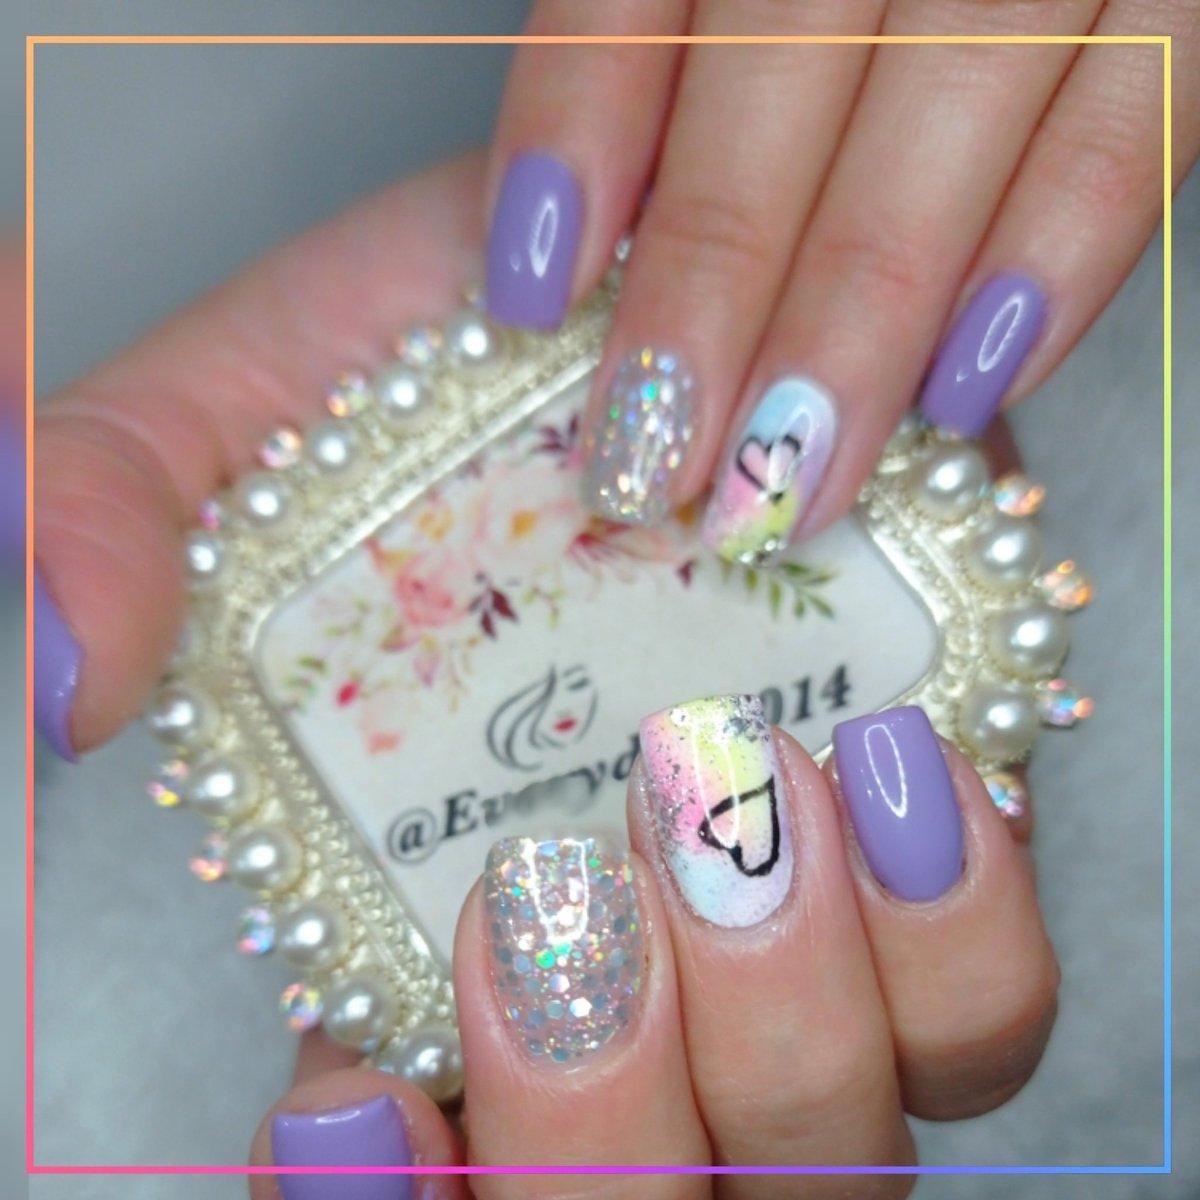 "Eliges el color conforme a tu estado de ánimo @everyday2014 Técnico en uñas #Solmaira  ""Tan perfecta como te lo imaginas"" . . Twitter: @everyday2014c.a Pag Facebook: @everydaycejas Whatsapp: 0426-1532090 . . #everyday2014 ,#Maquillaje #CejasSemipermanentes #CejasMicroblading https://t.co/O7oWoAseQQ"